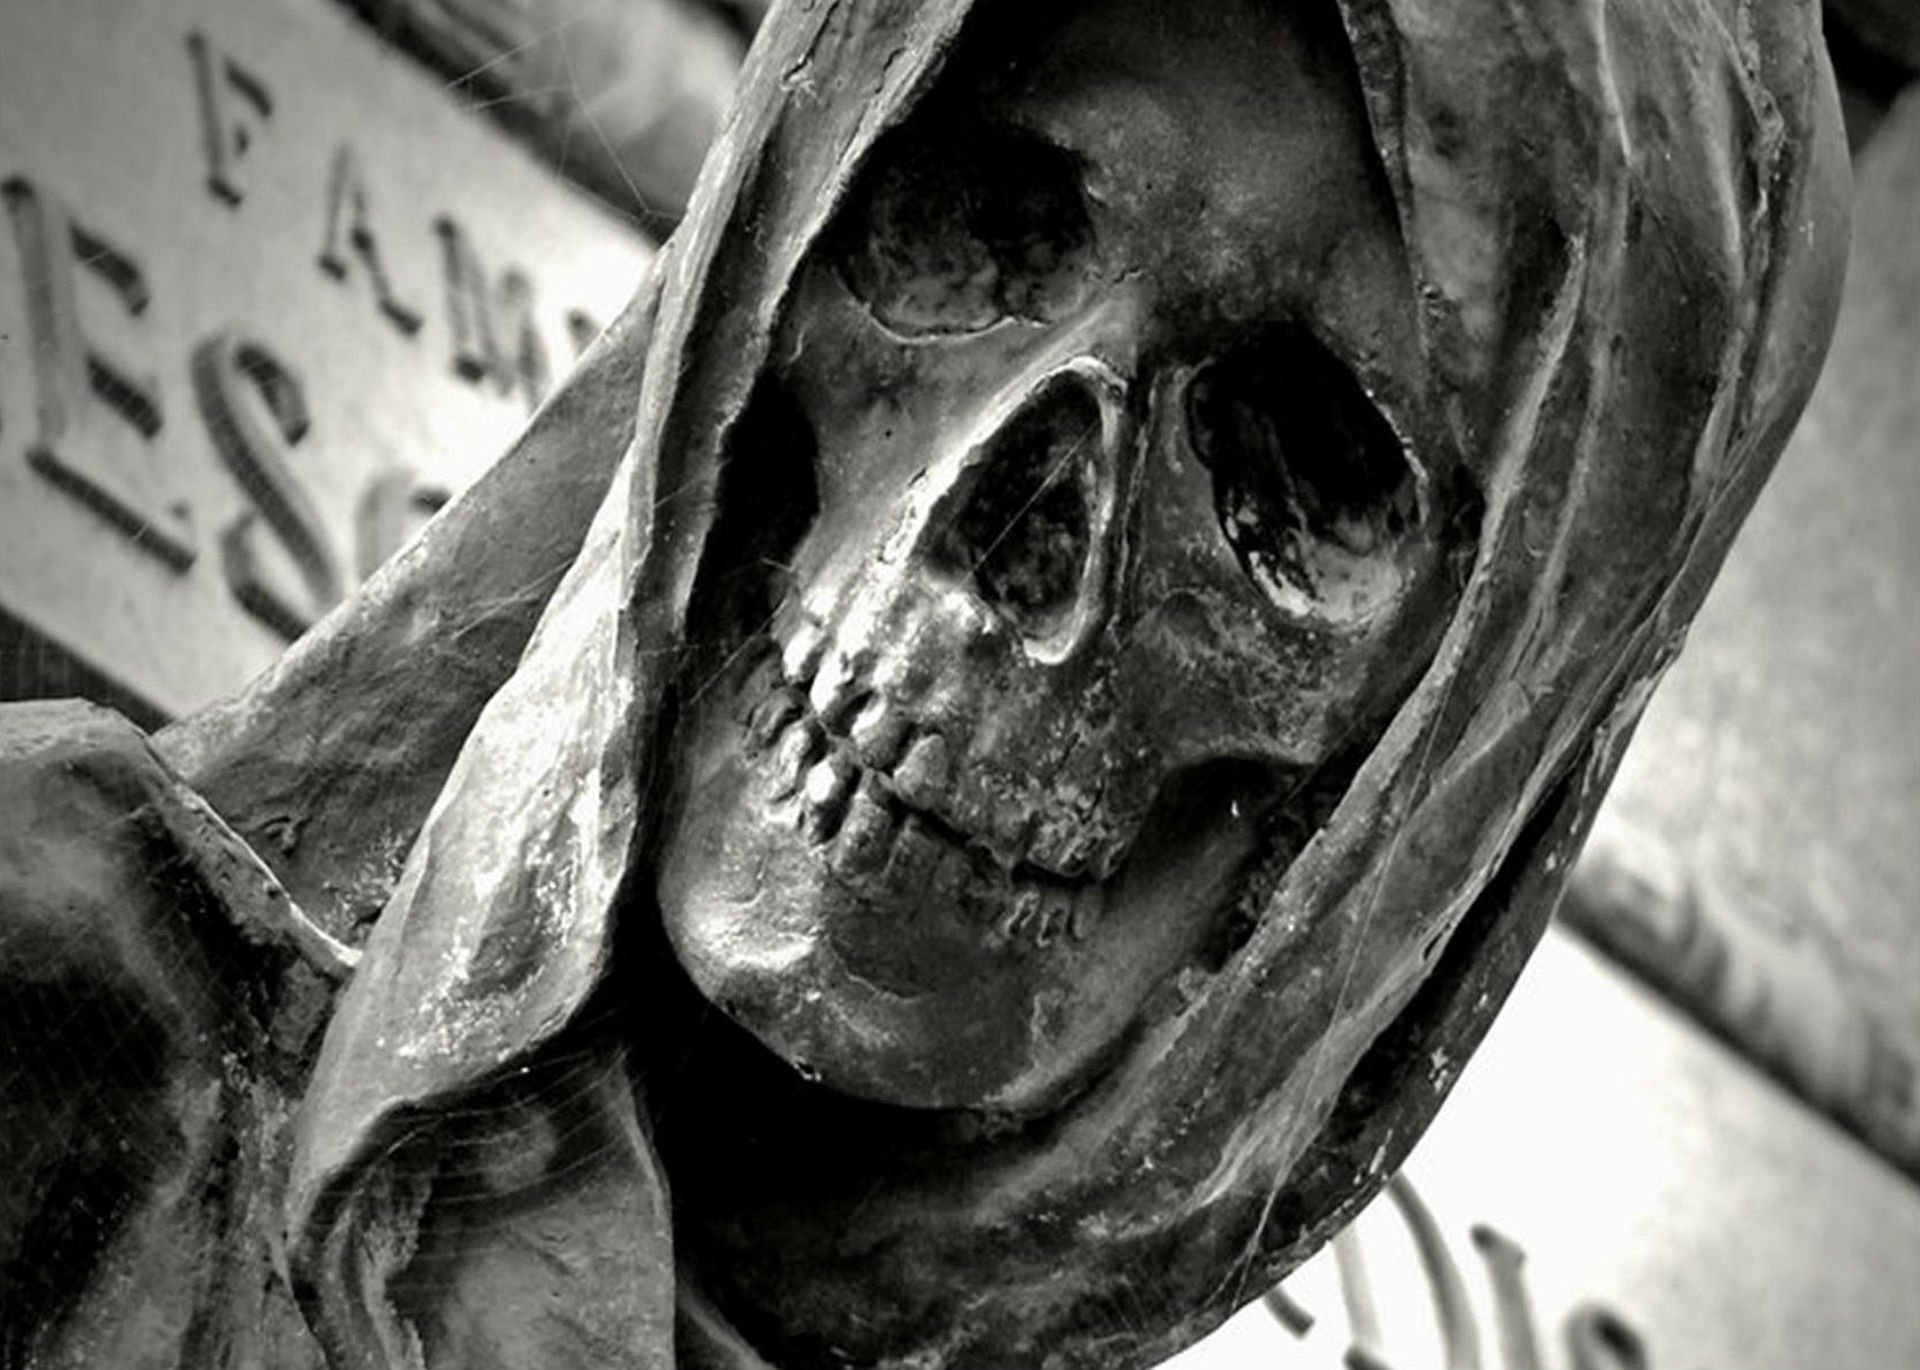 Dark horror evil occult satan satanic creepy wallpaper ...